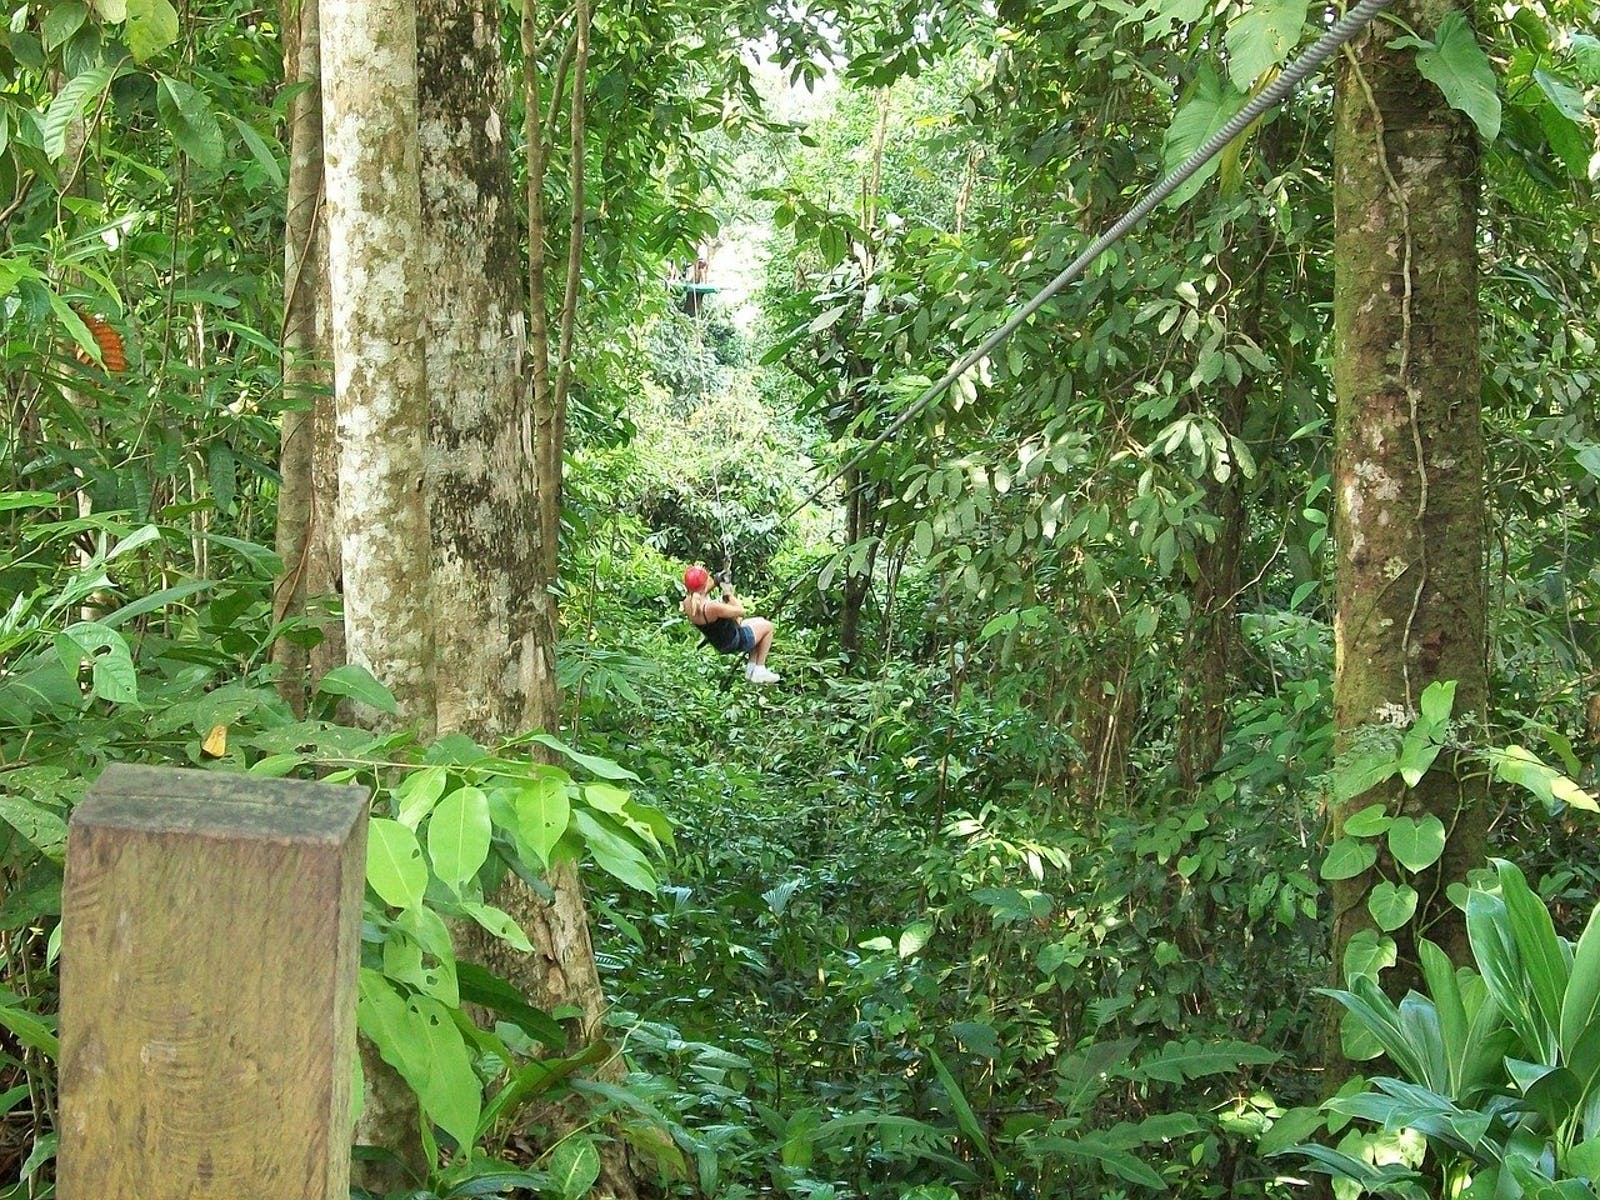 Zipline cutting through the rainforest in Costa Rica